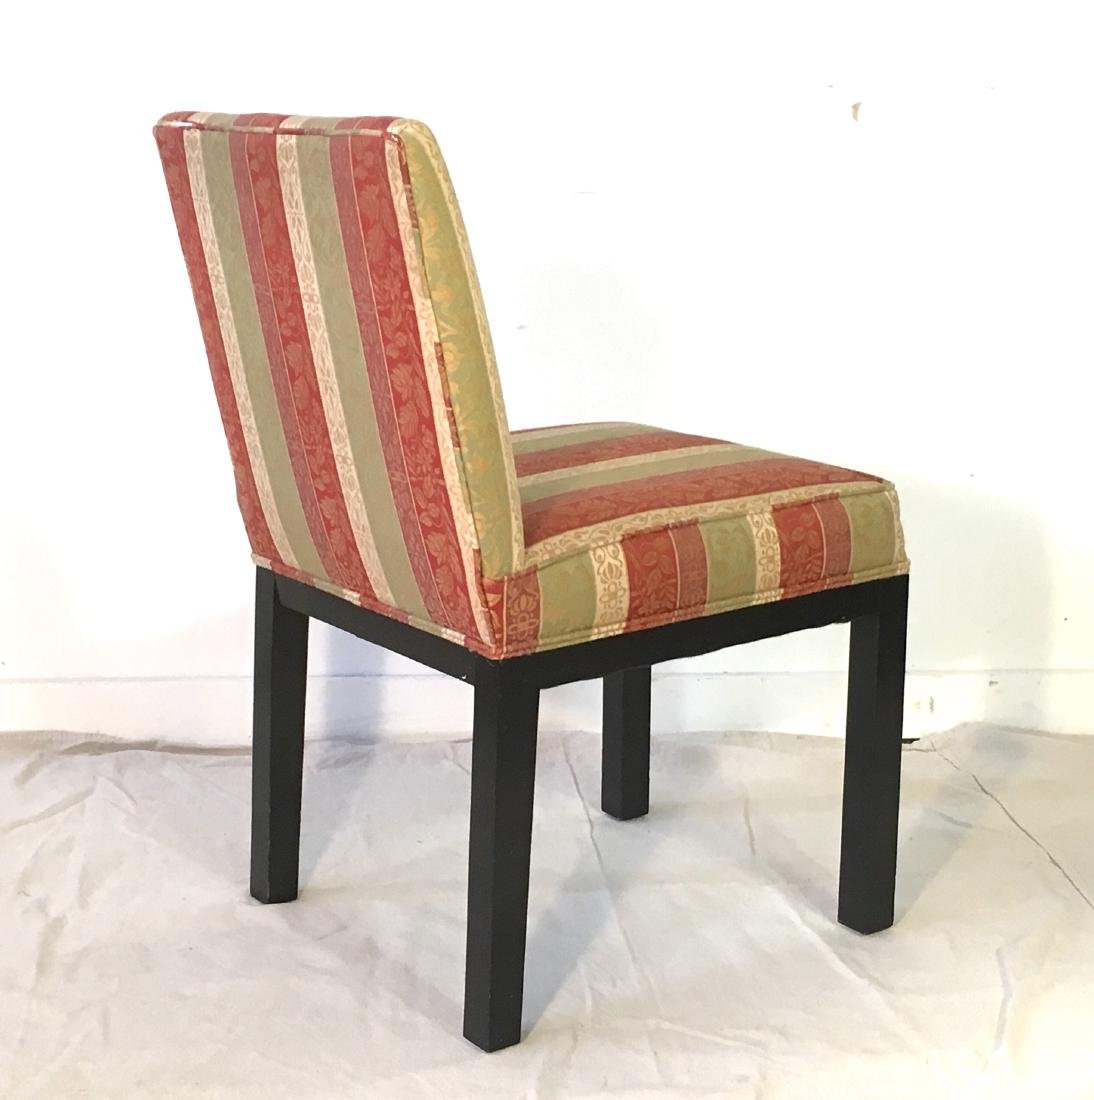 Set of 10 John Widdicomb Dining Chairs - 4